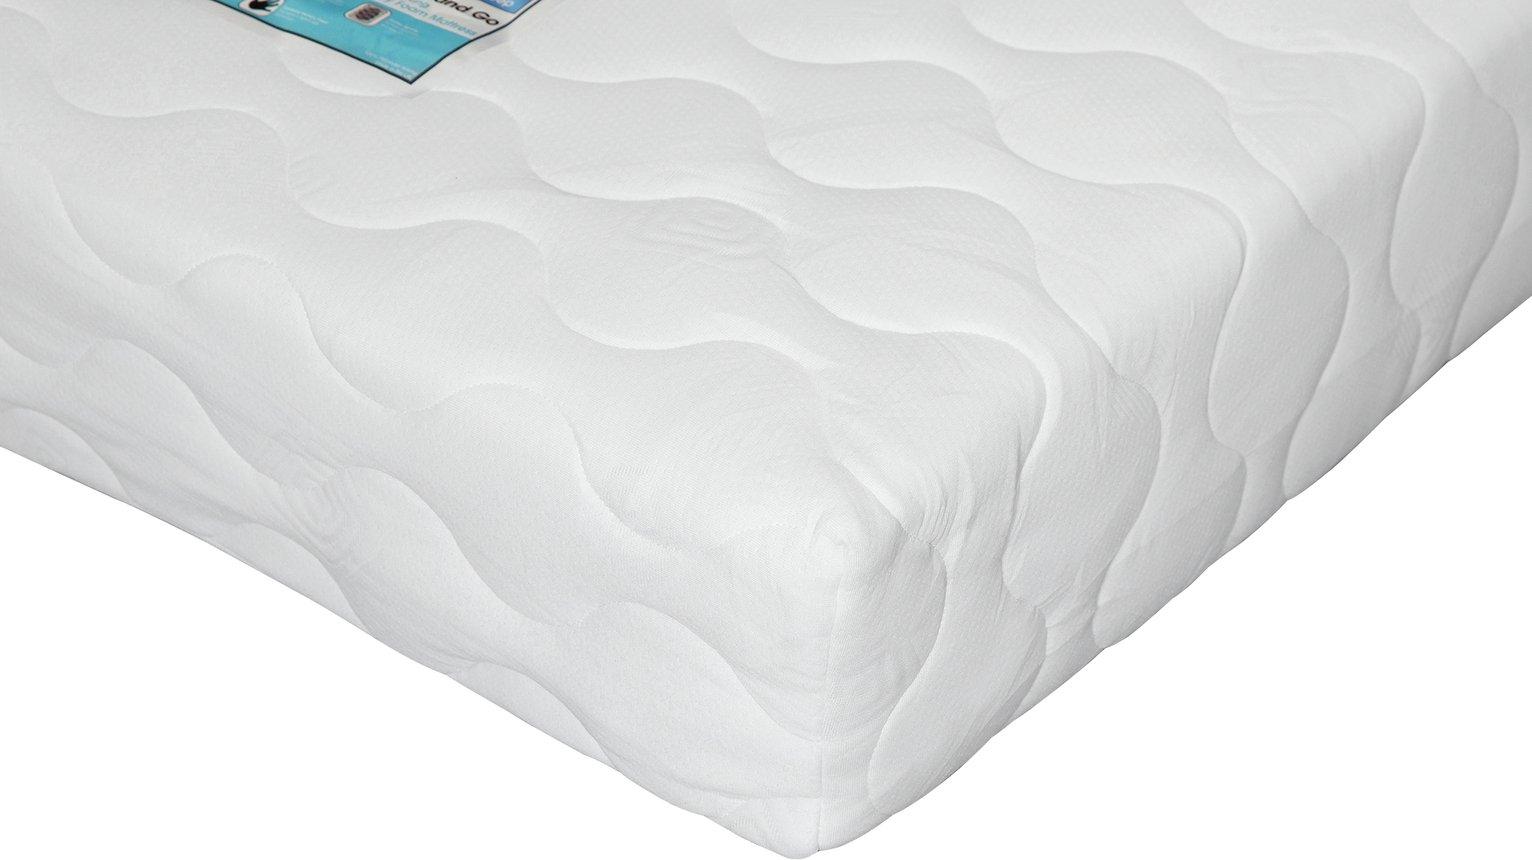 isleep collect and go pocket single memory foam mattress